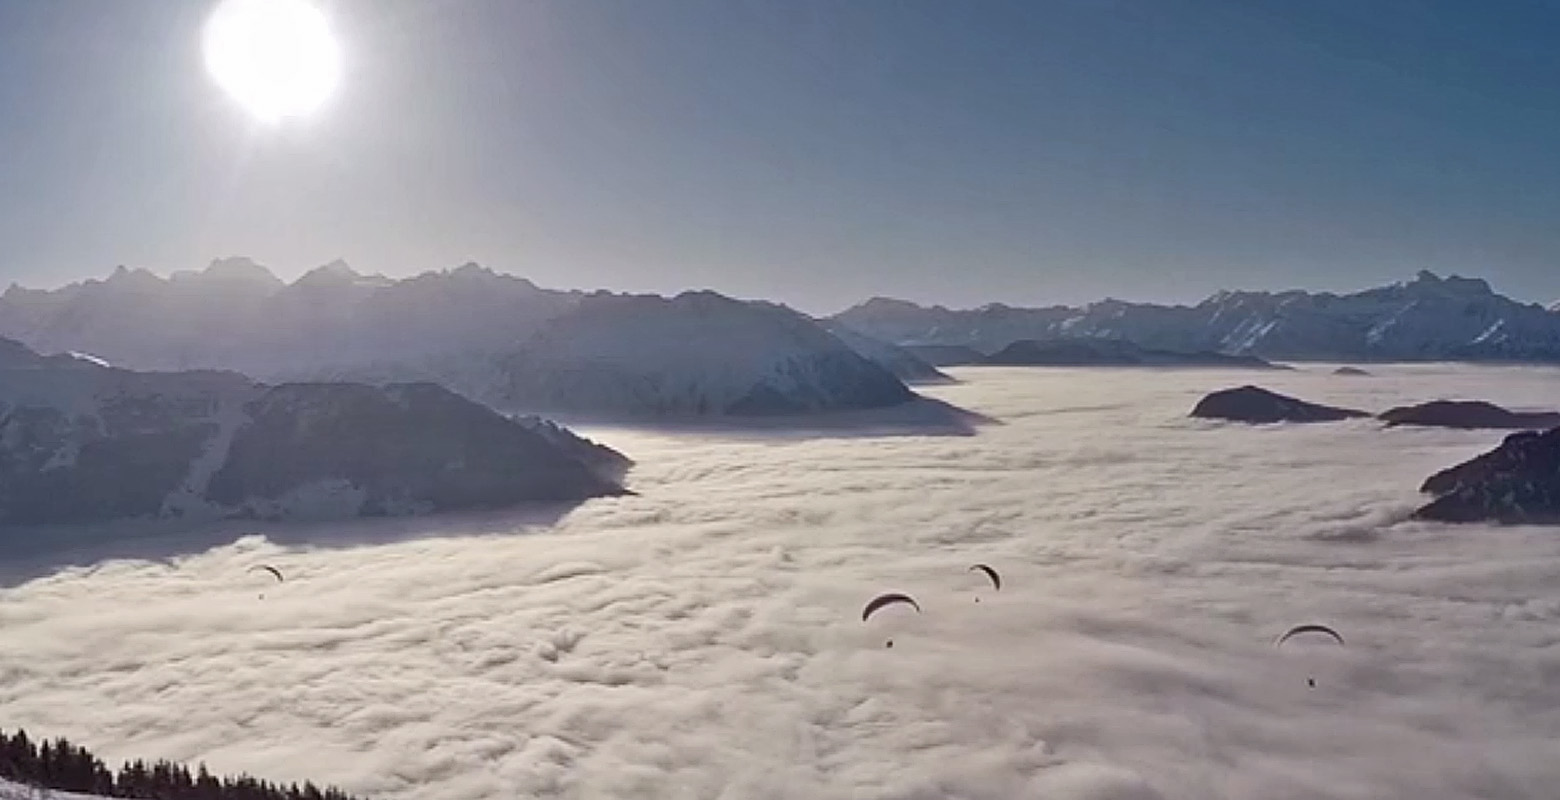 Verbier, Switzerland: ParaSailing on skis Credit: Mark Subi